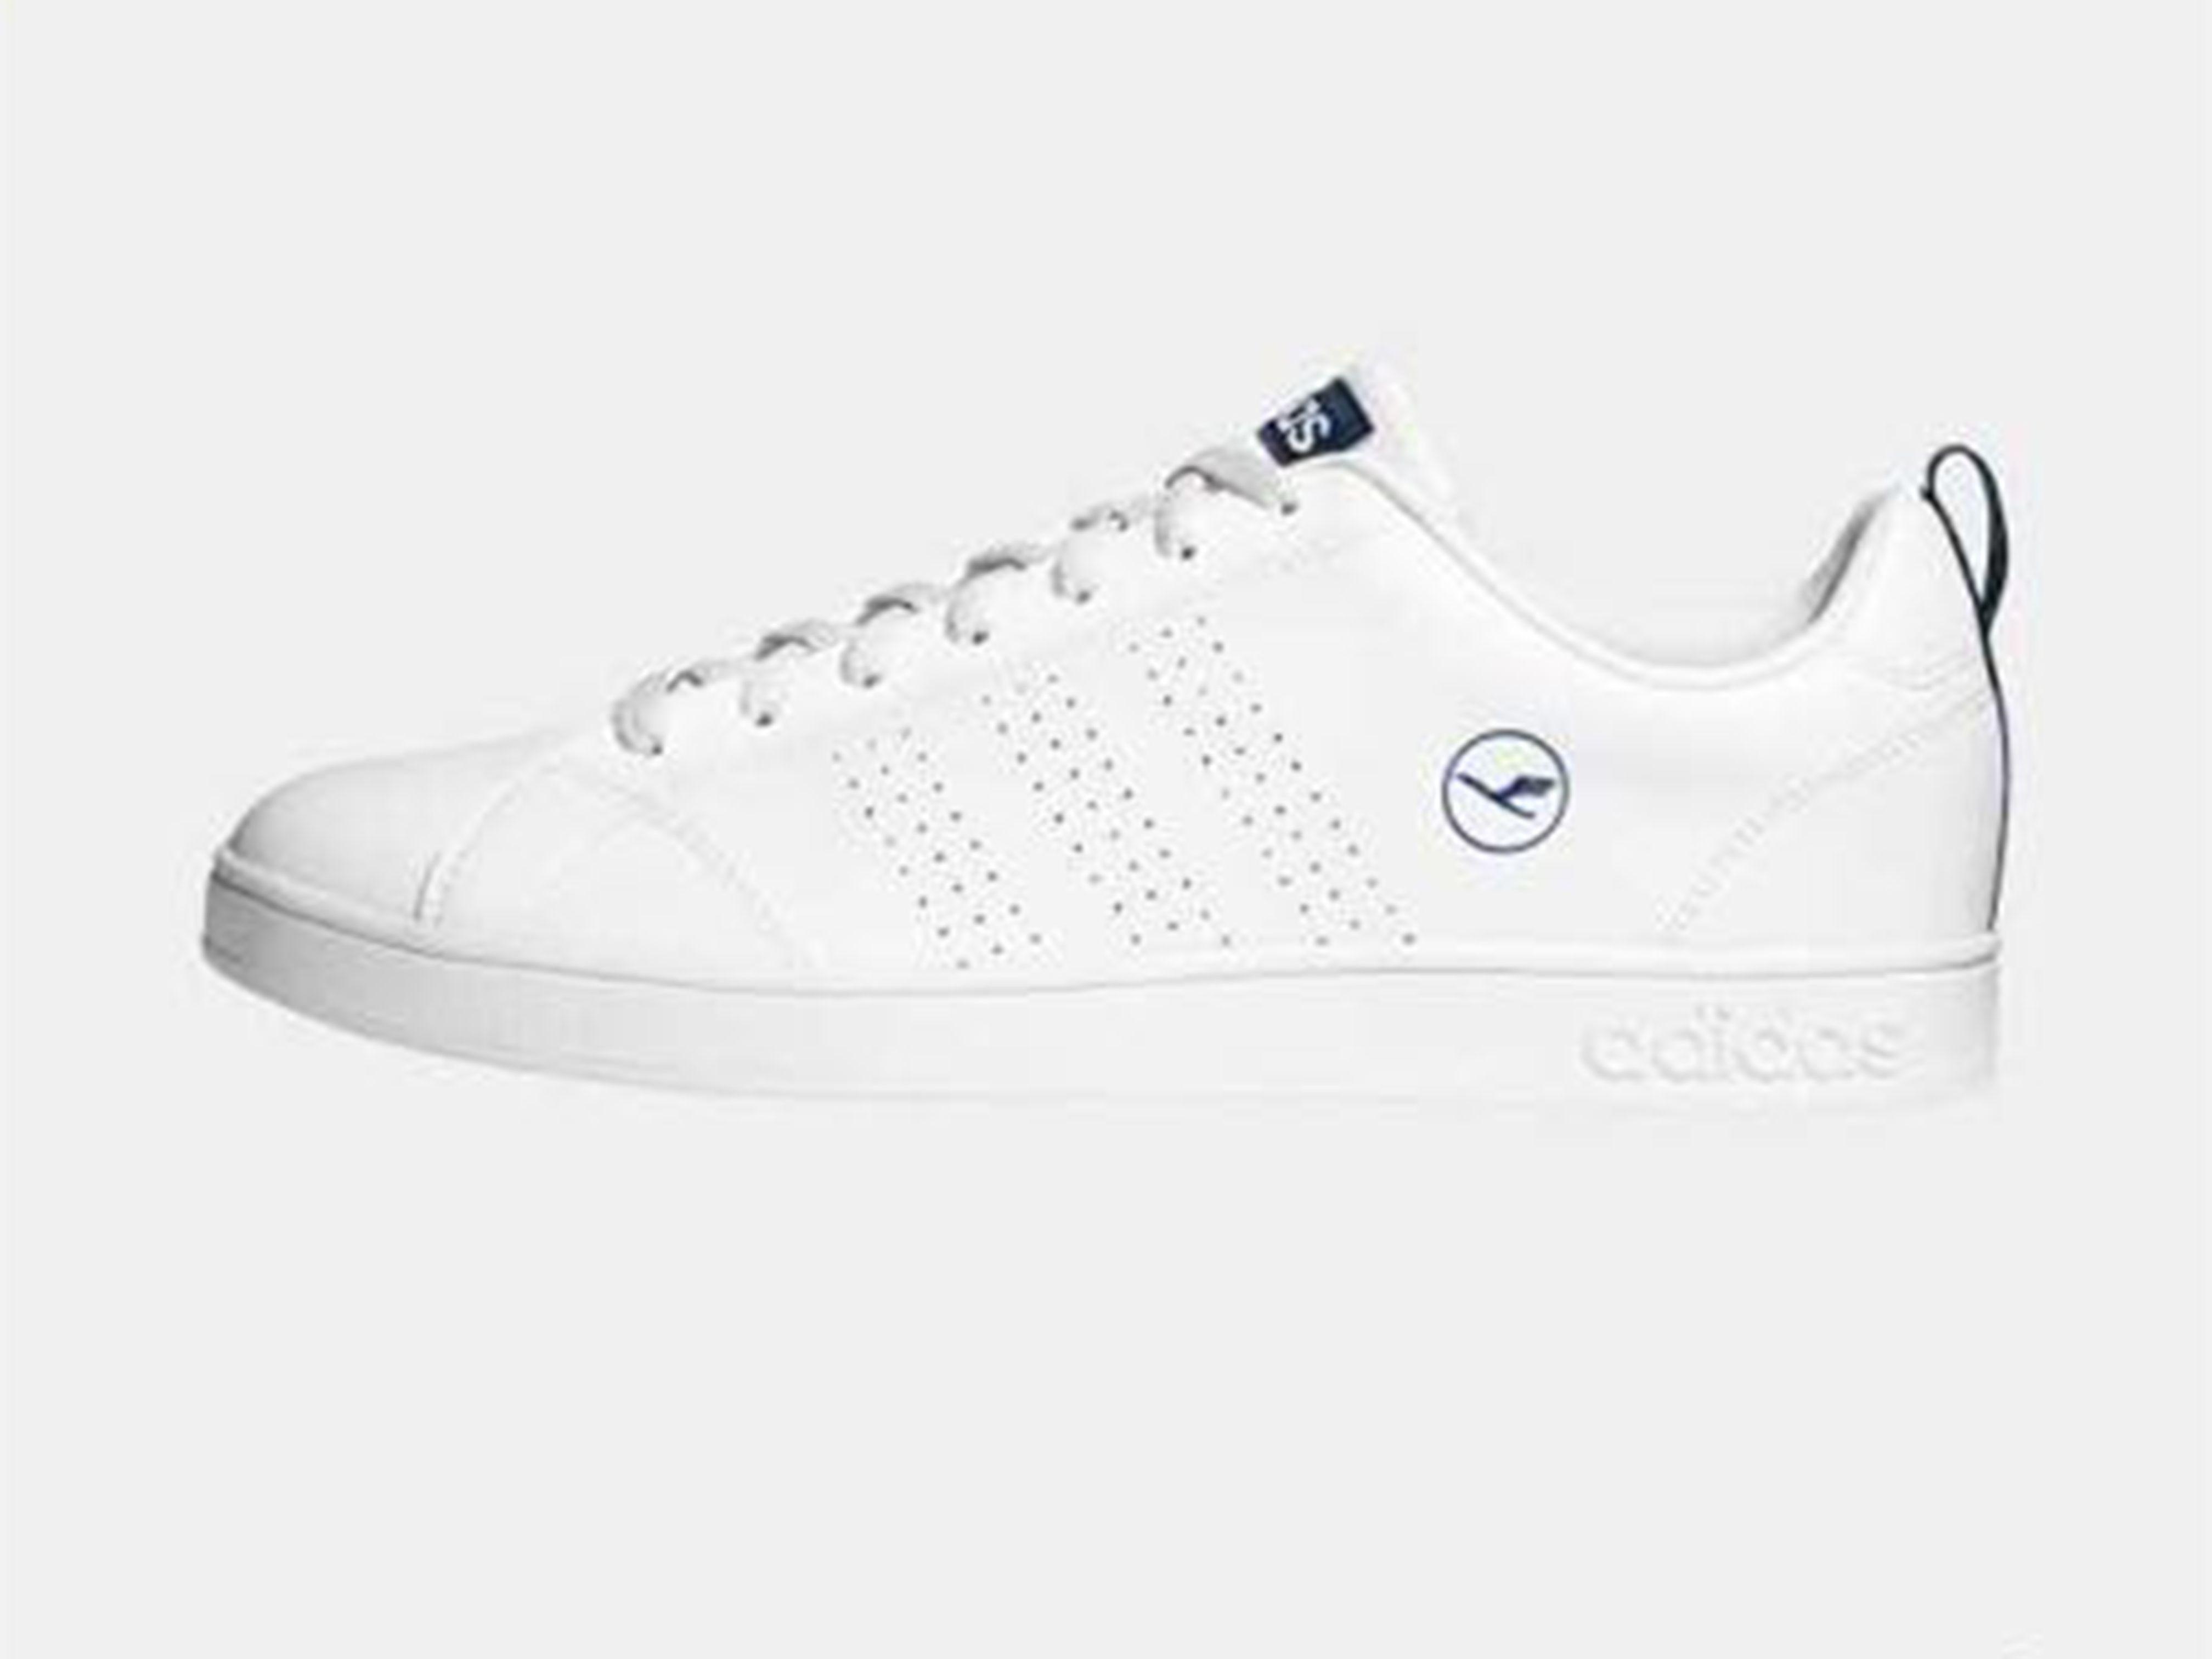 Adidas Lufthansa Edition